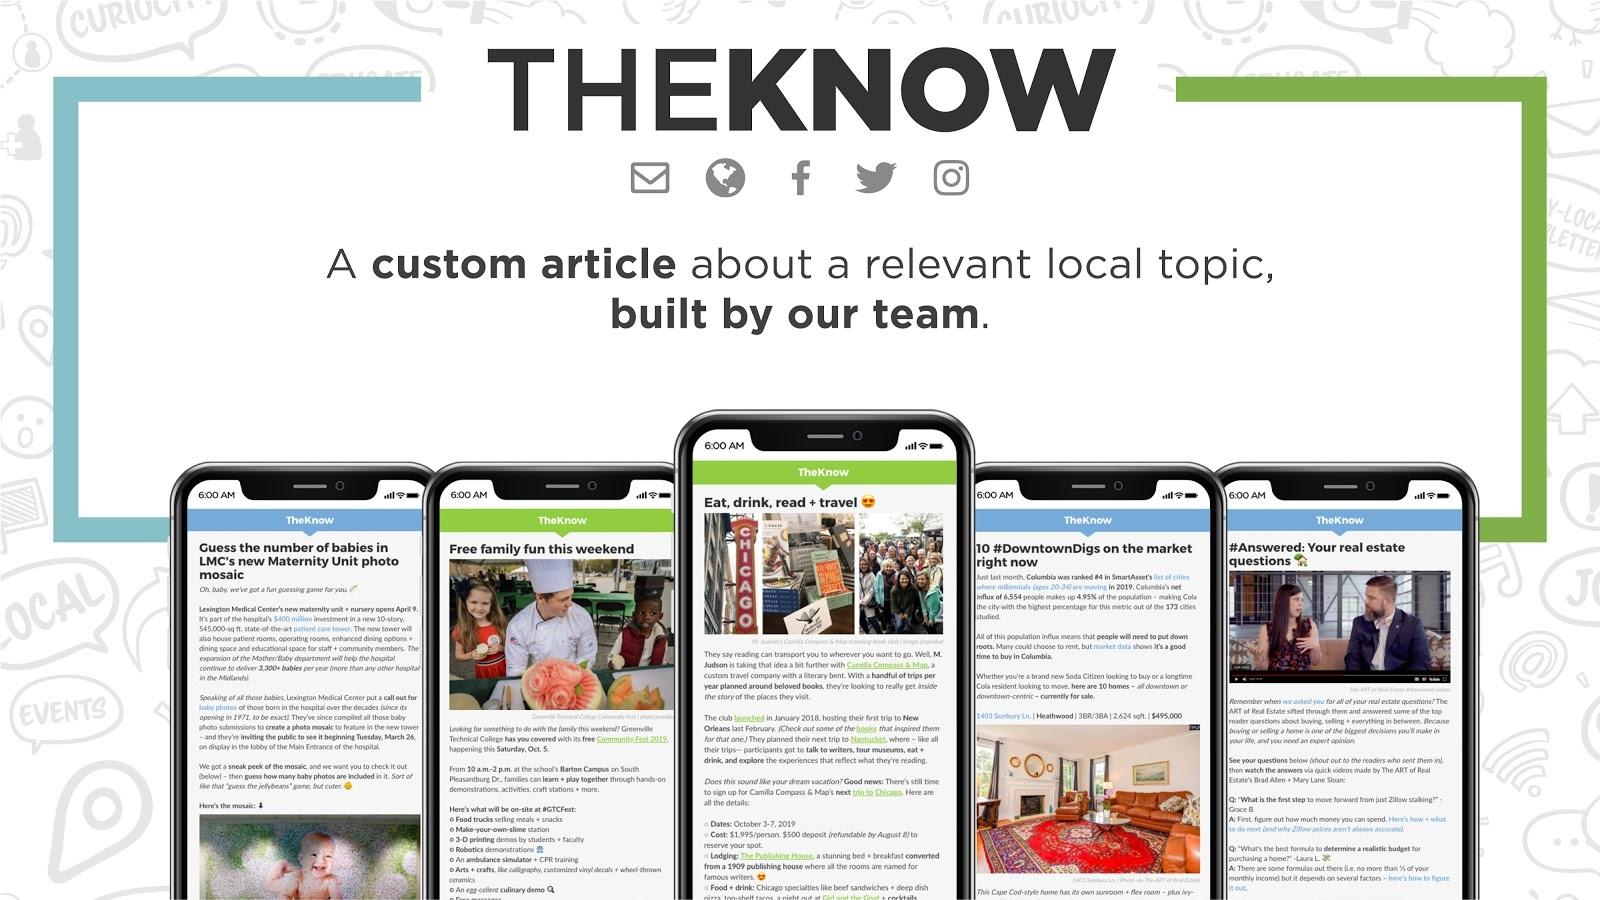 TheKnow